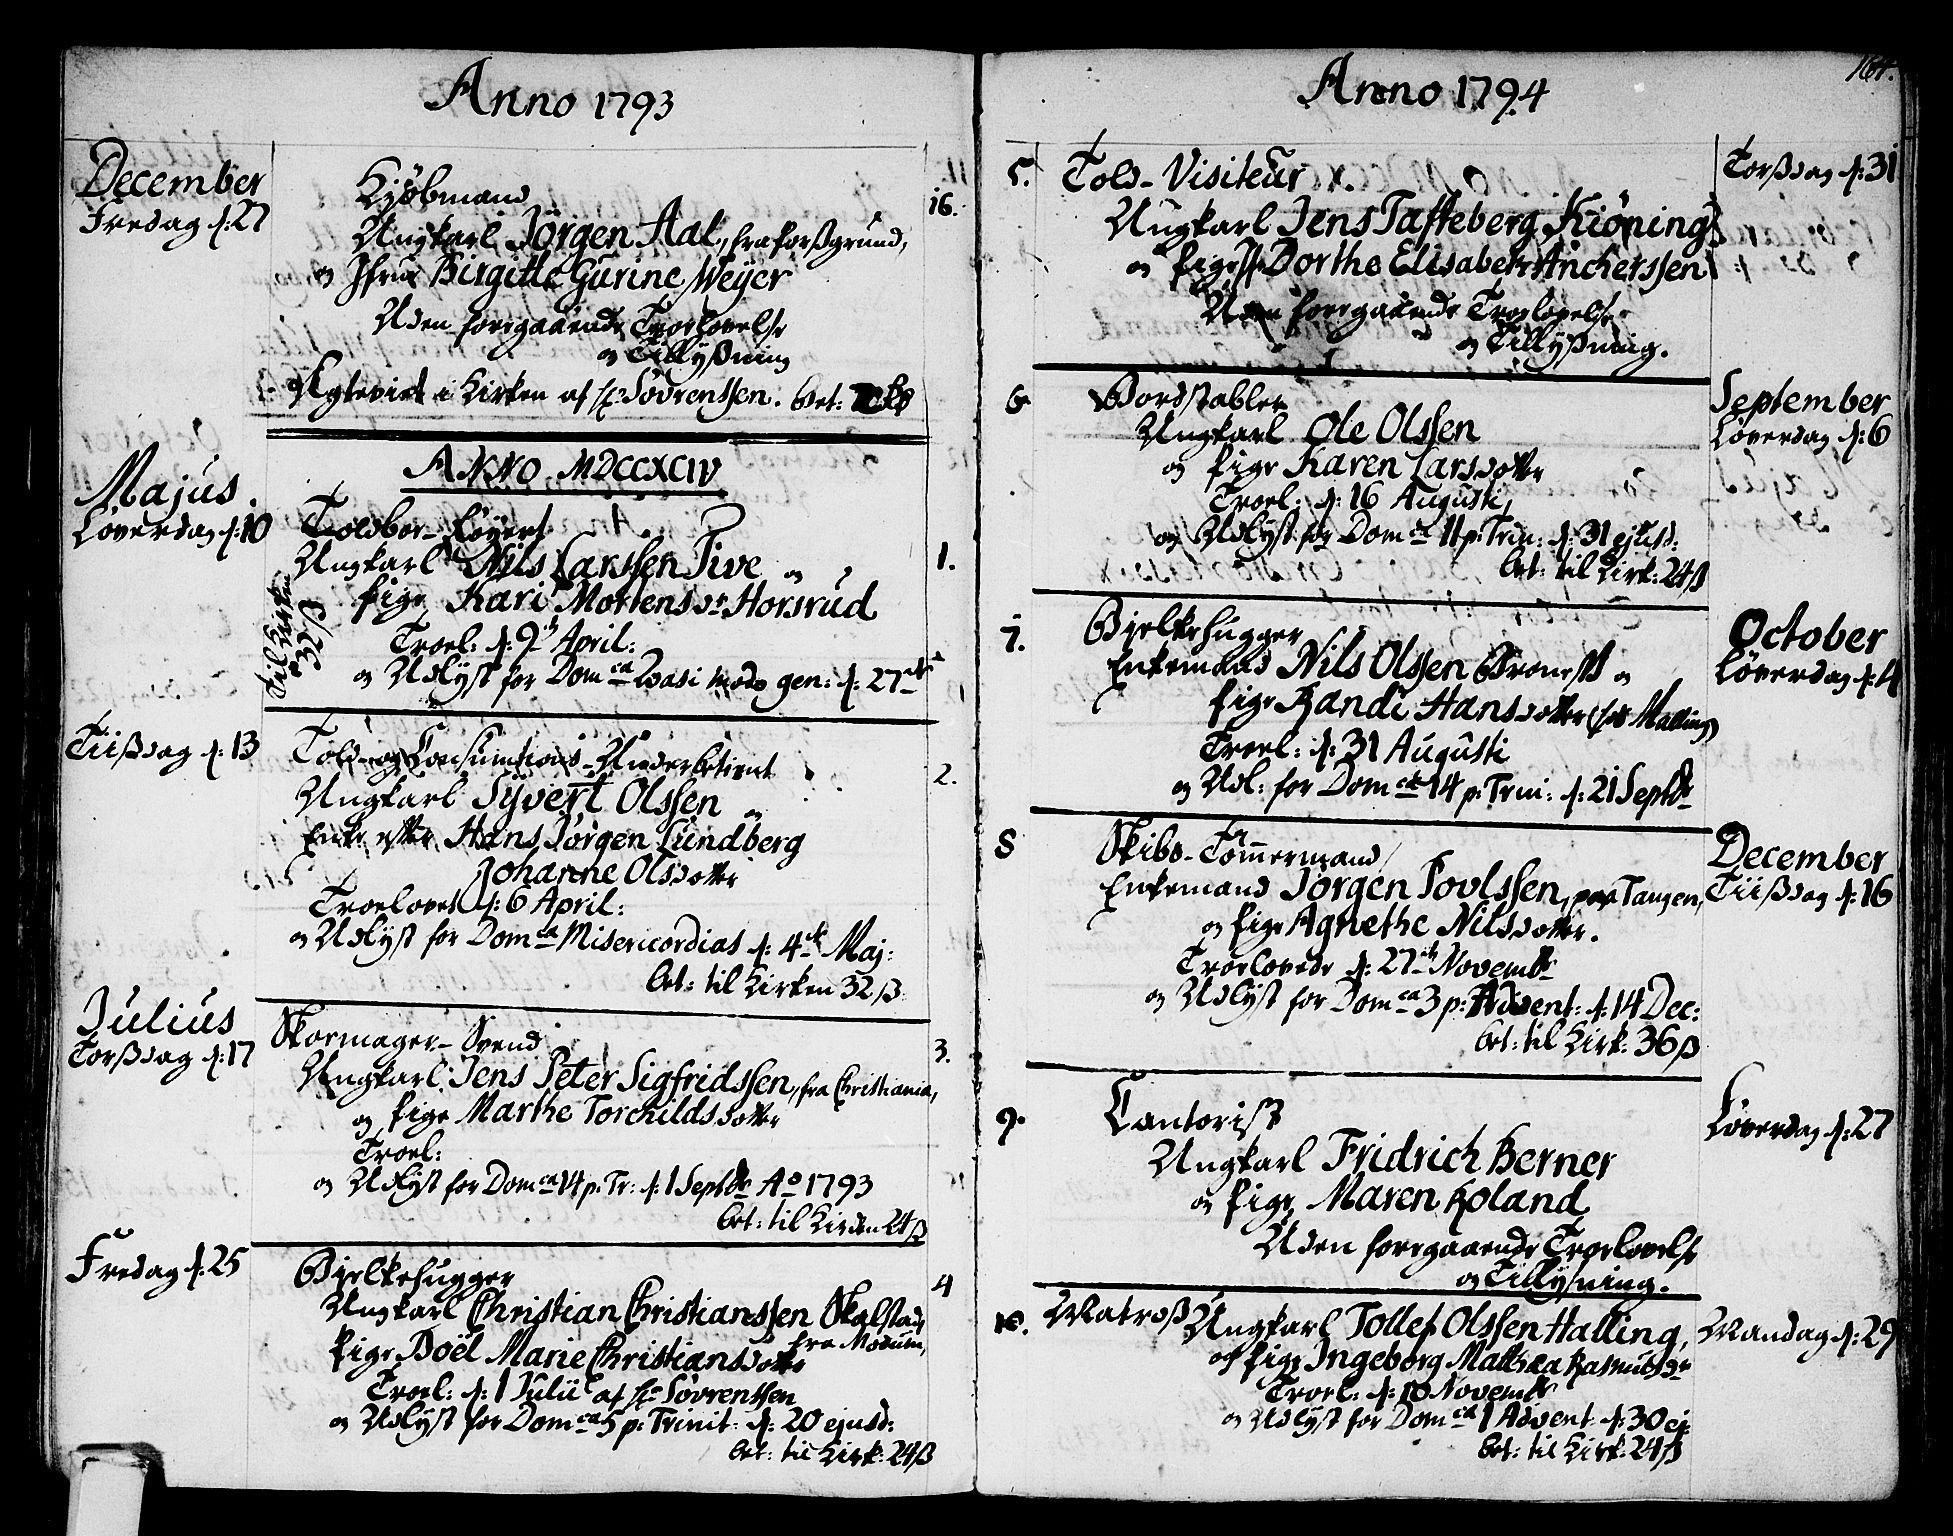 SAKO, Strømsø kirkebøker, F/Fa/L0010: Parish register (official) no. I 10, 1792-1822, p. 164